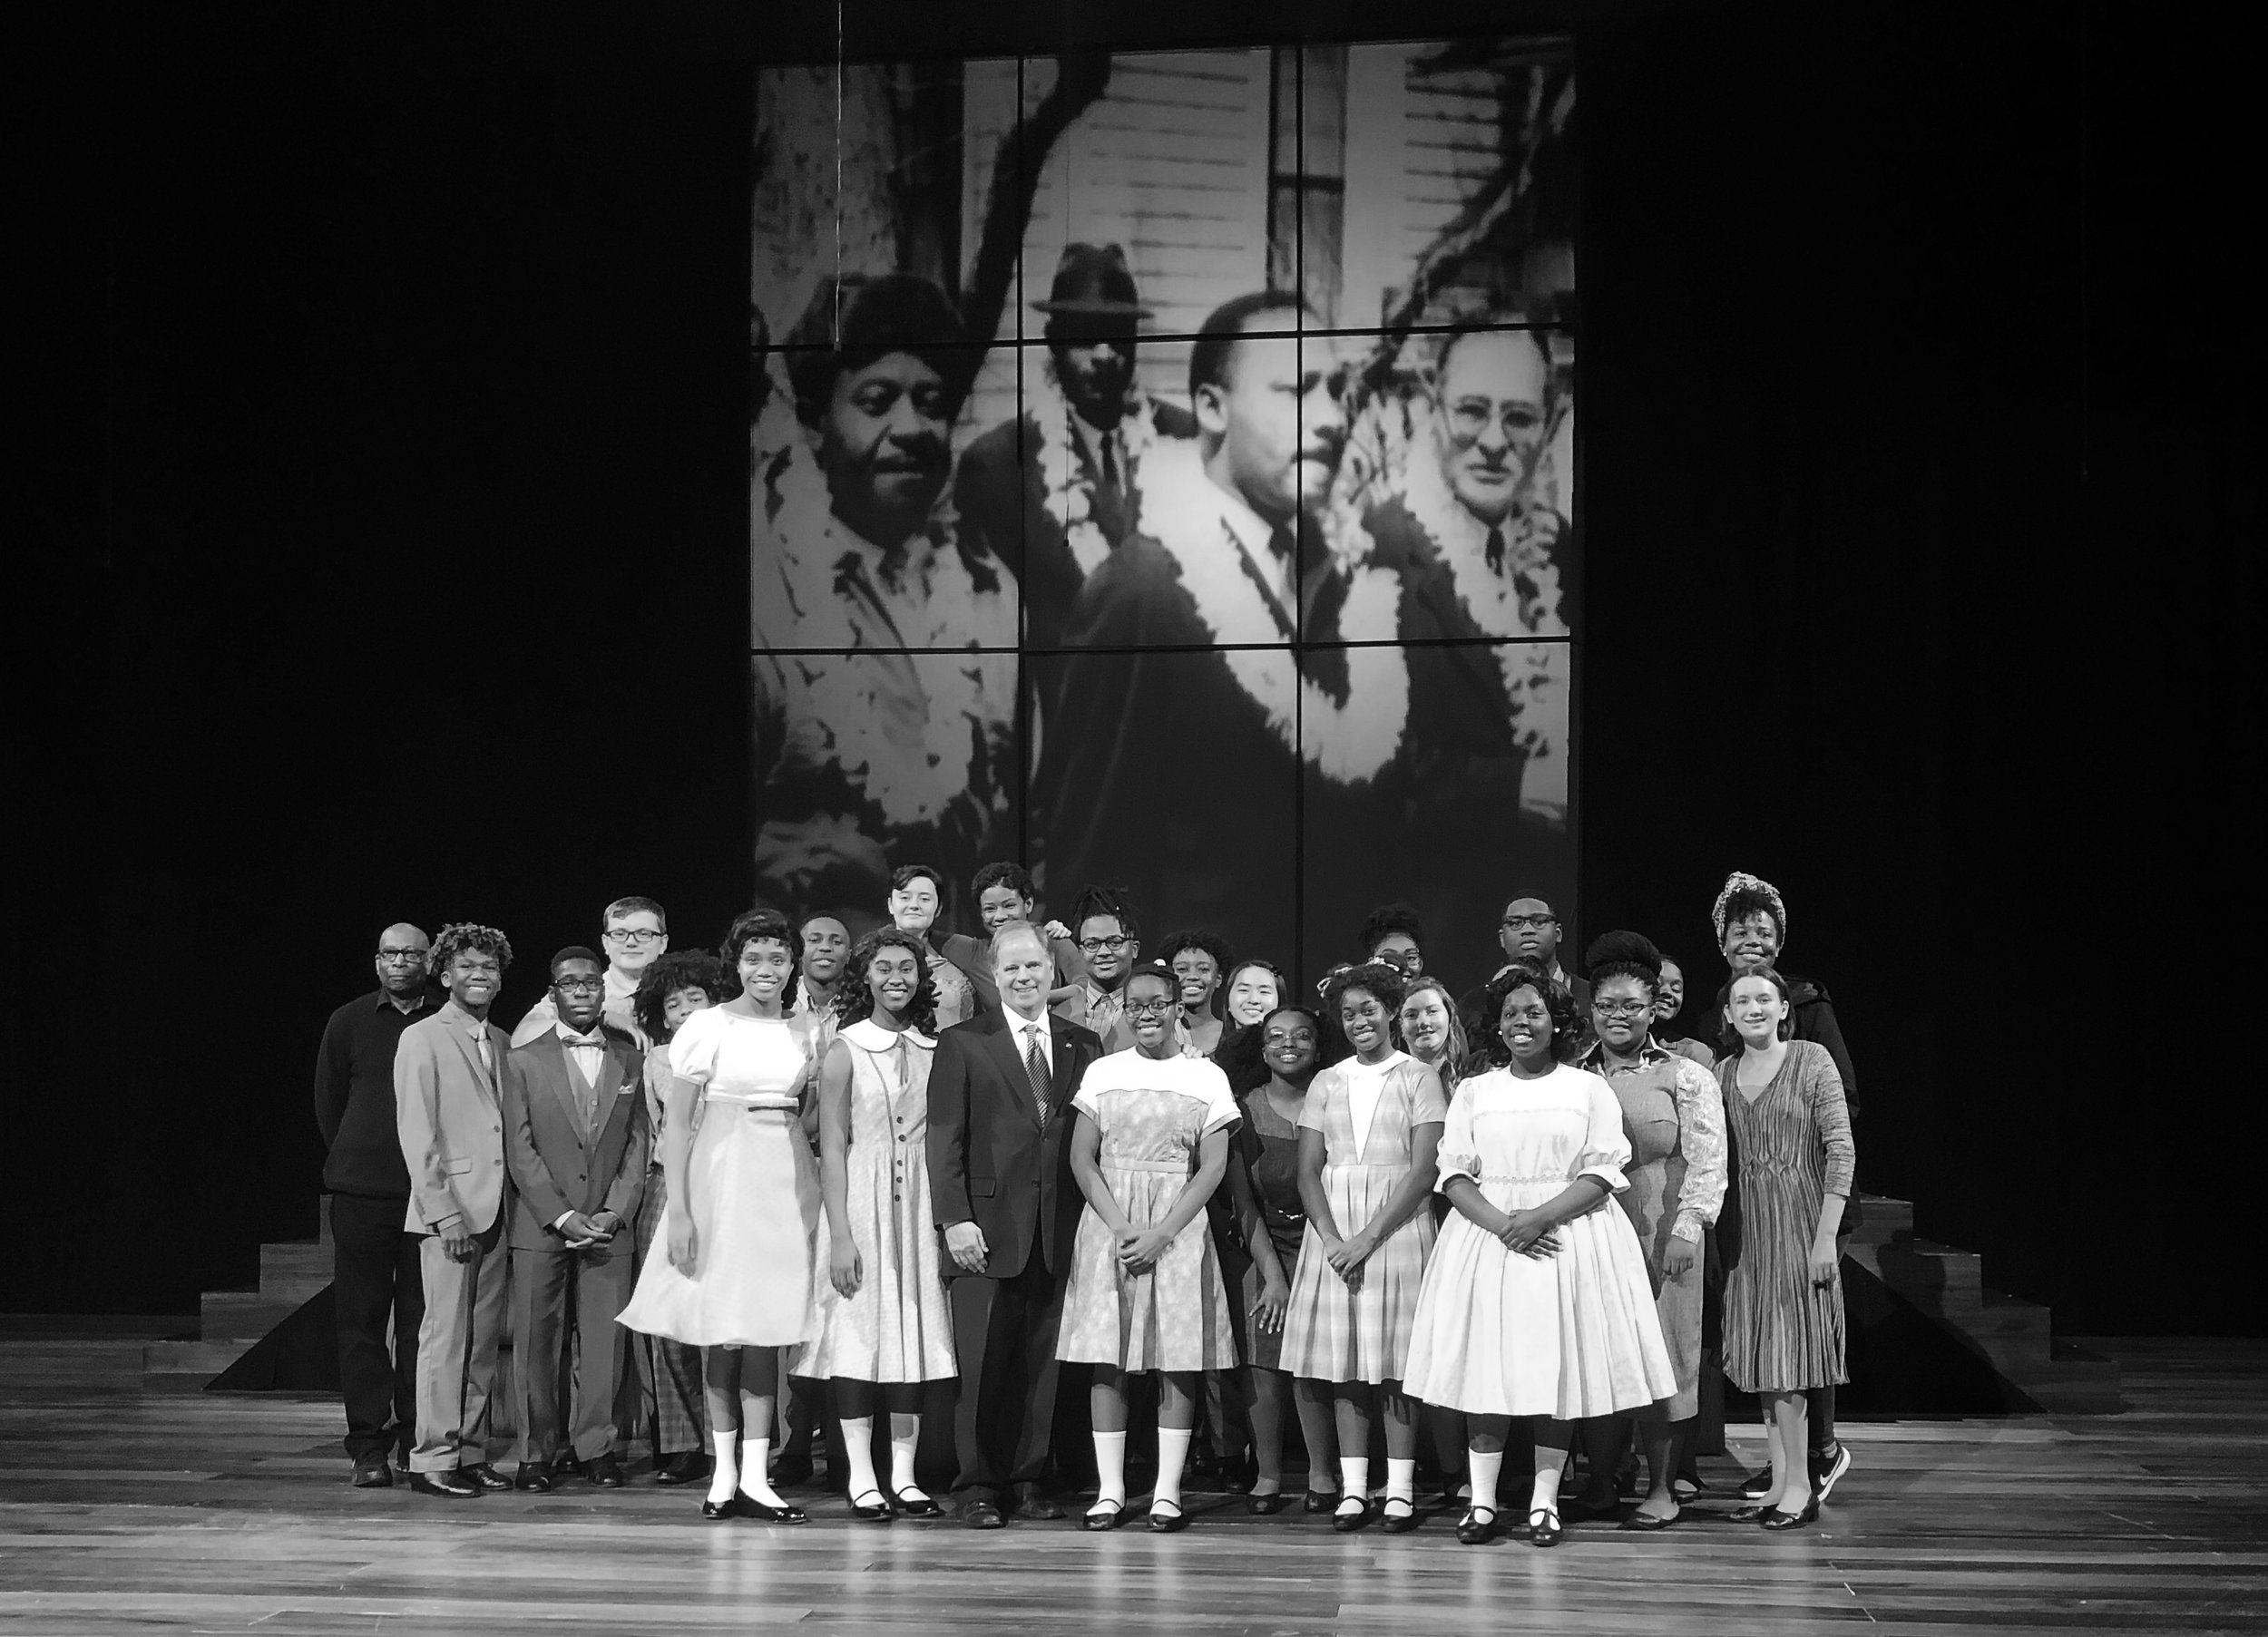 Four Little Girls  cast pictured with Sen. Doug Jones of Alabama. Jones prosecuted the KKK members convicted for the 16th Street Baptist Church bombing.